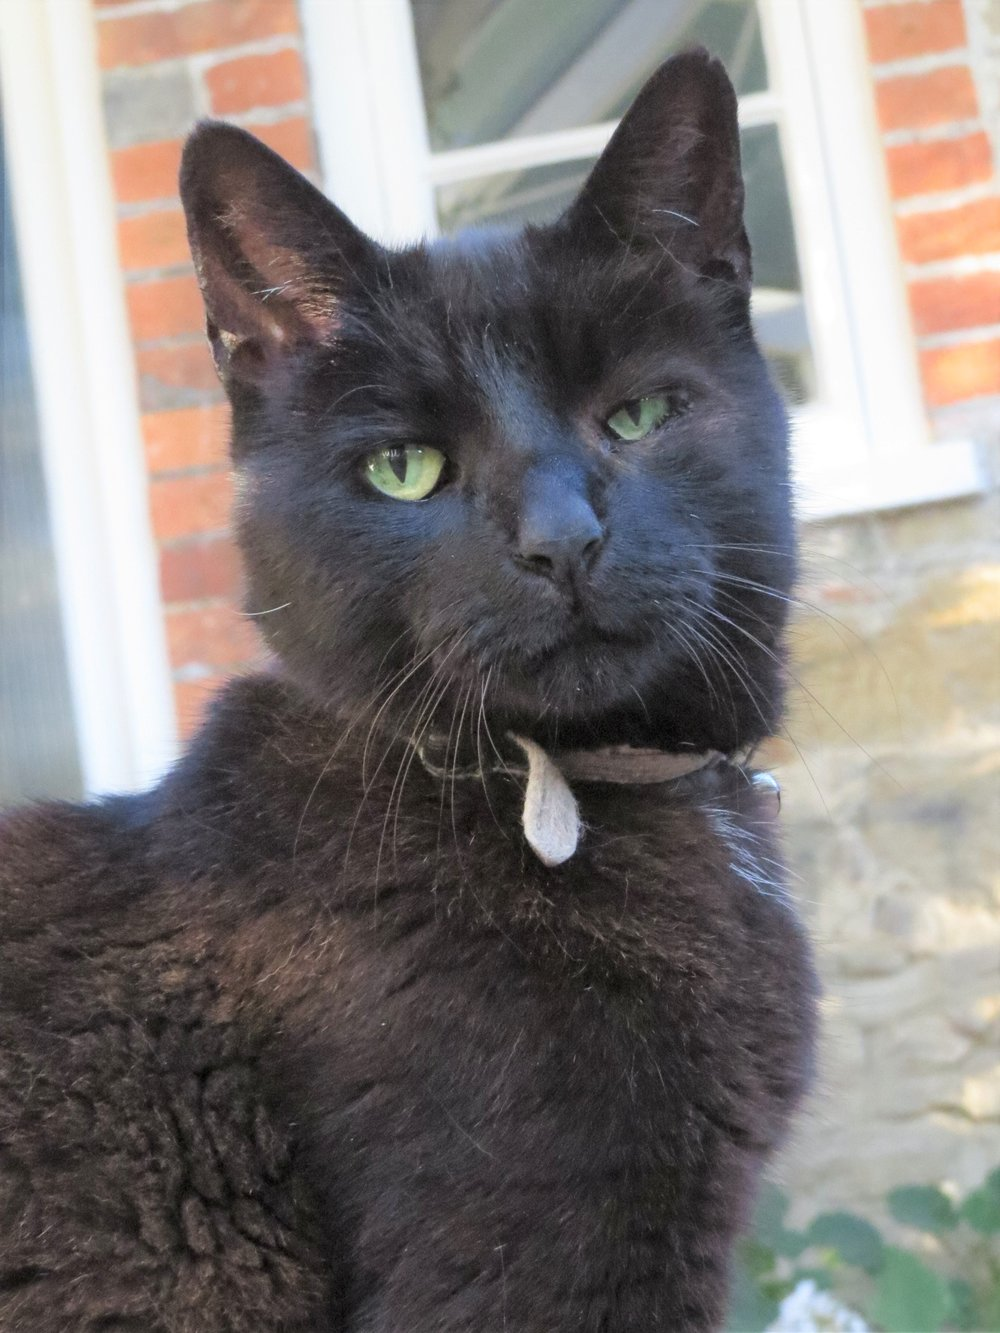 'Black Cat' ref.JPG